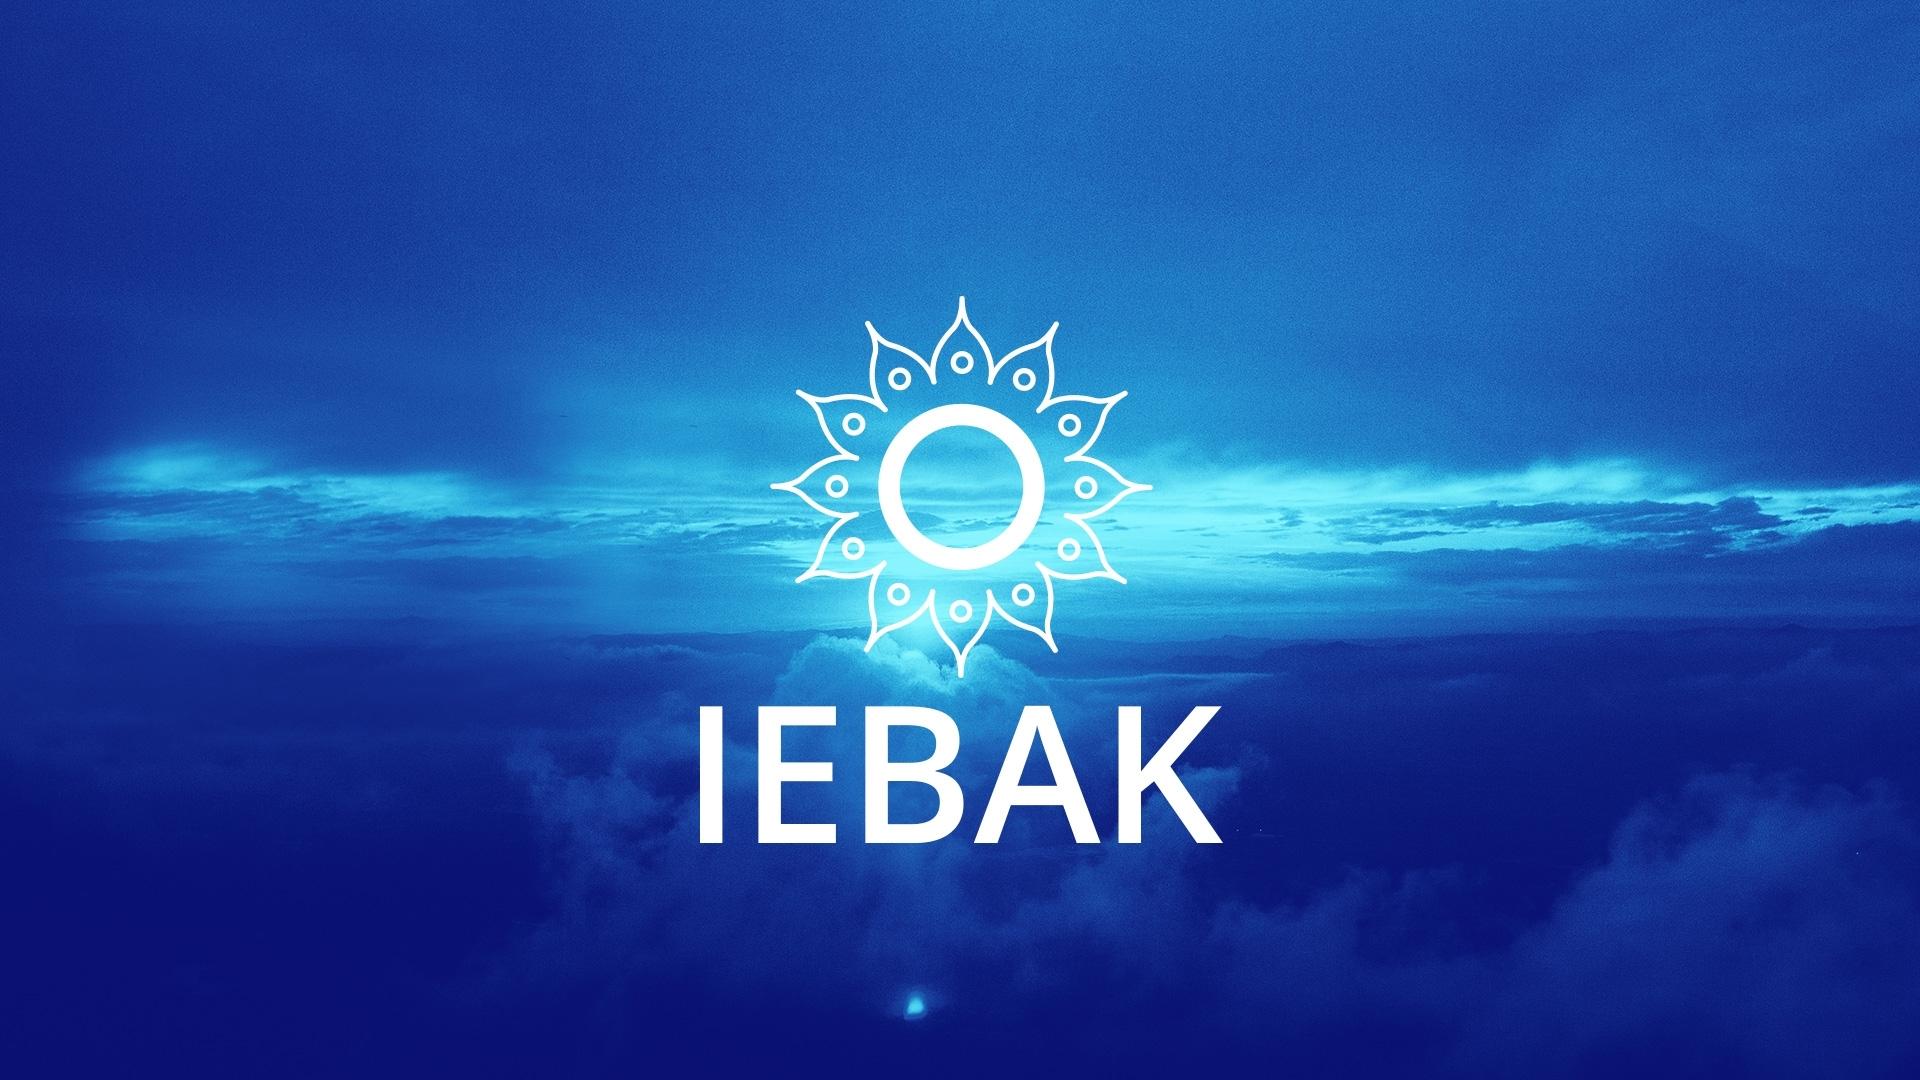 IEBAK